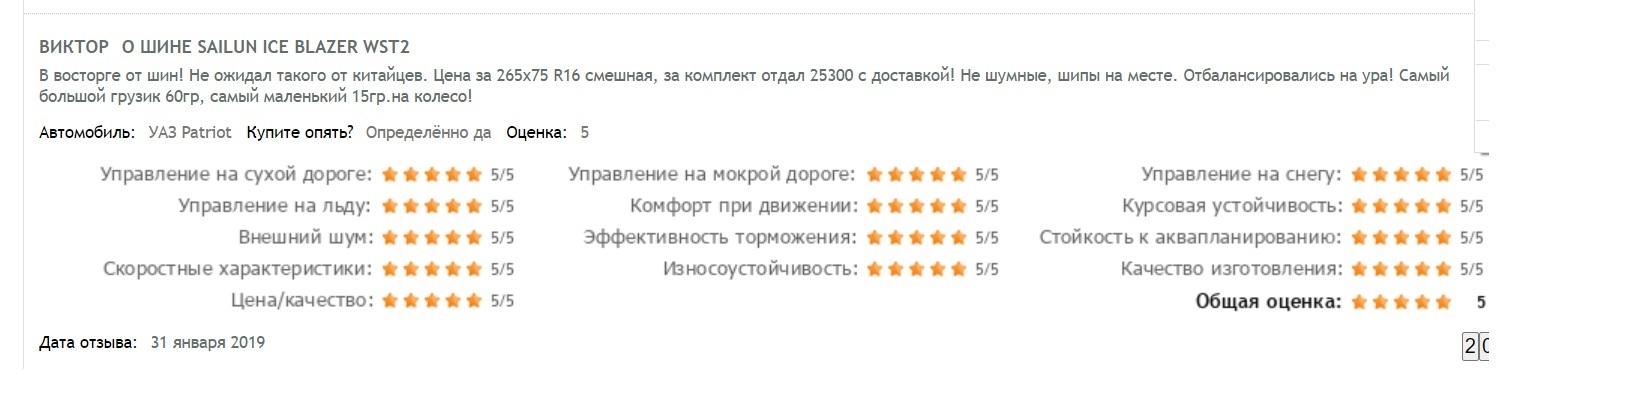 Отзыв о шинах Sailun Ice Blazer Wst2